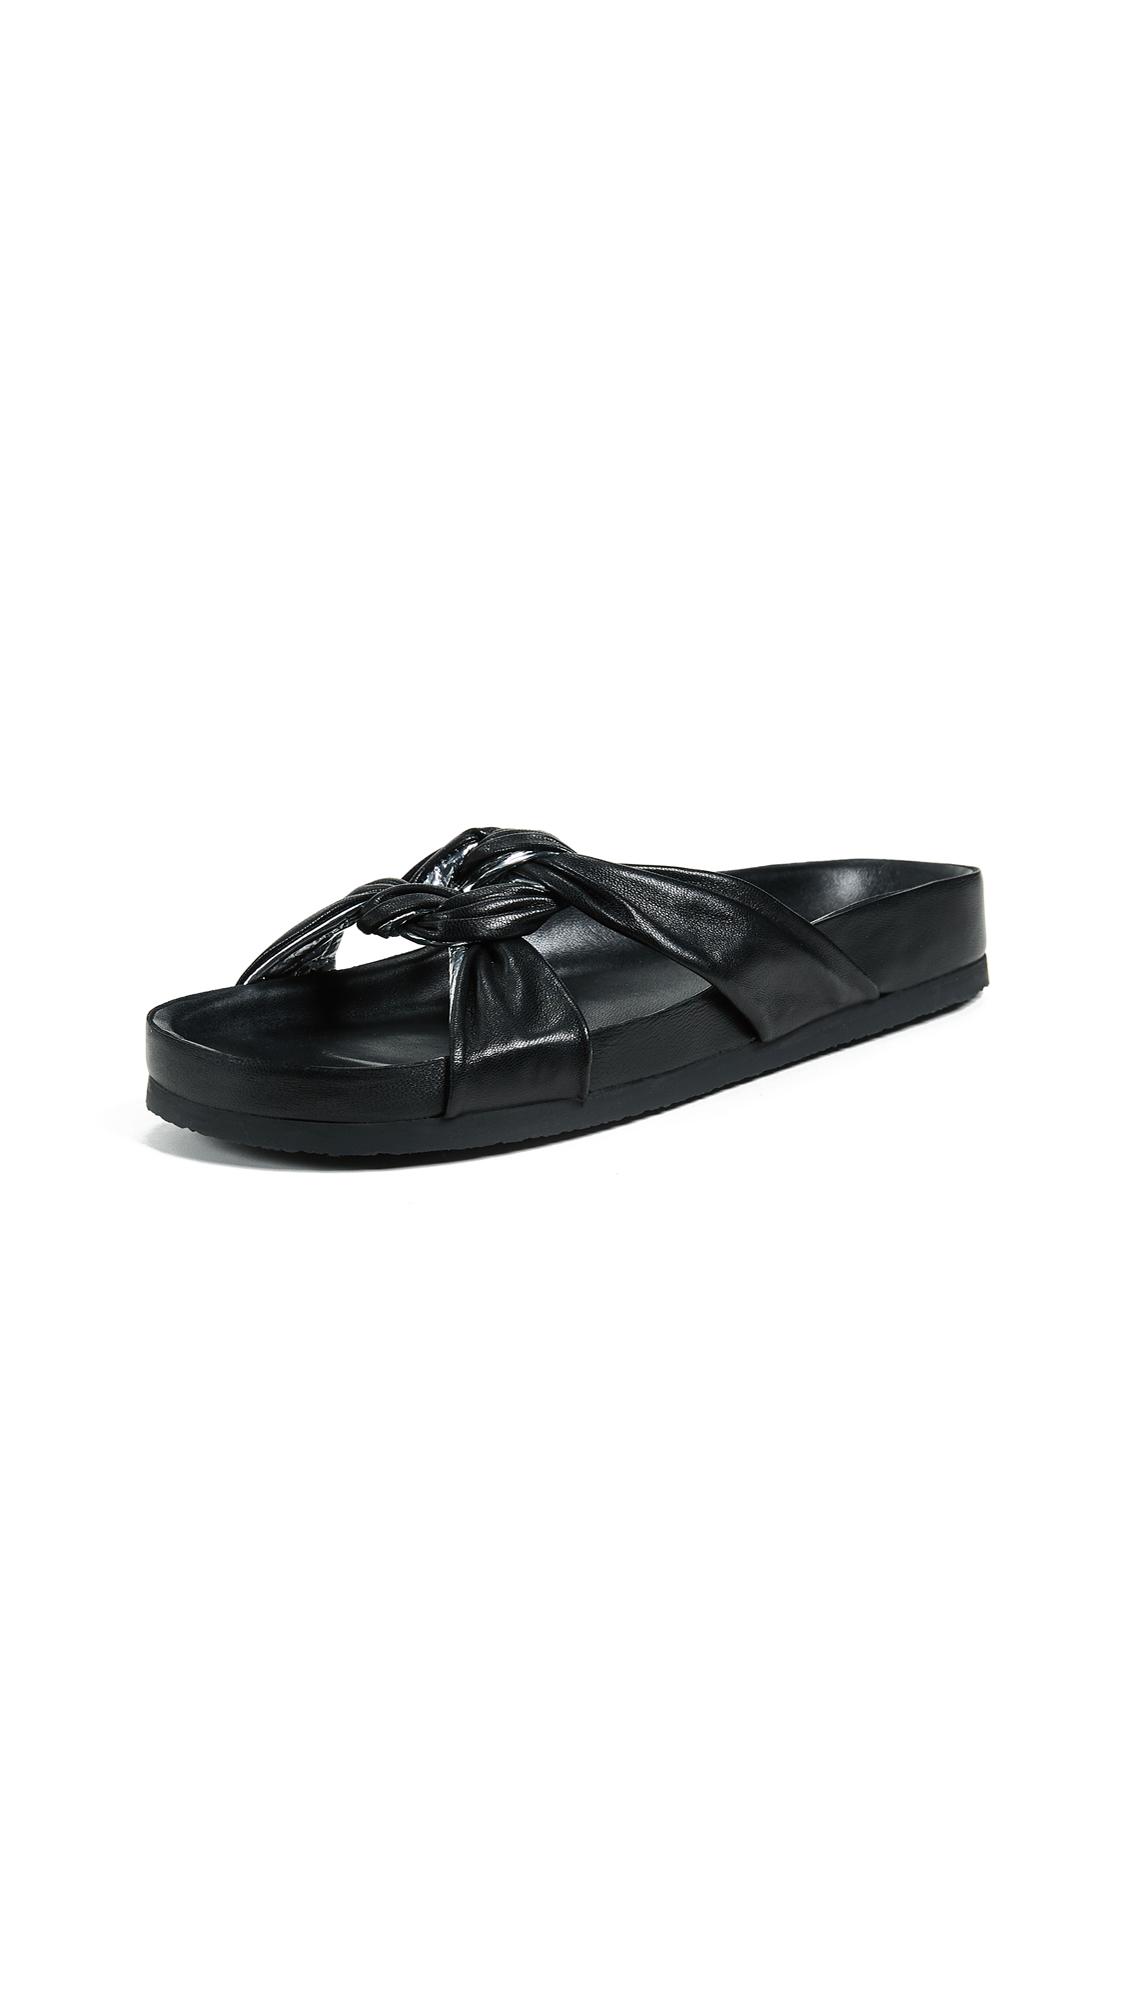 IRO Knoty Slides - Black/Silver